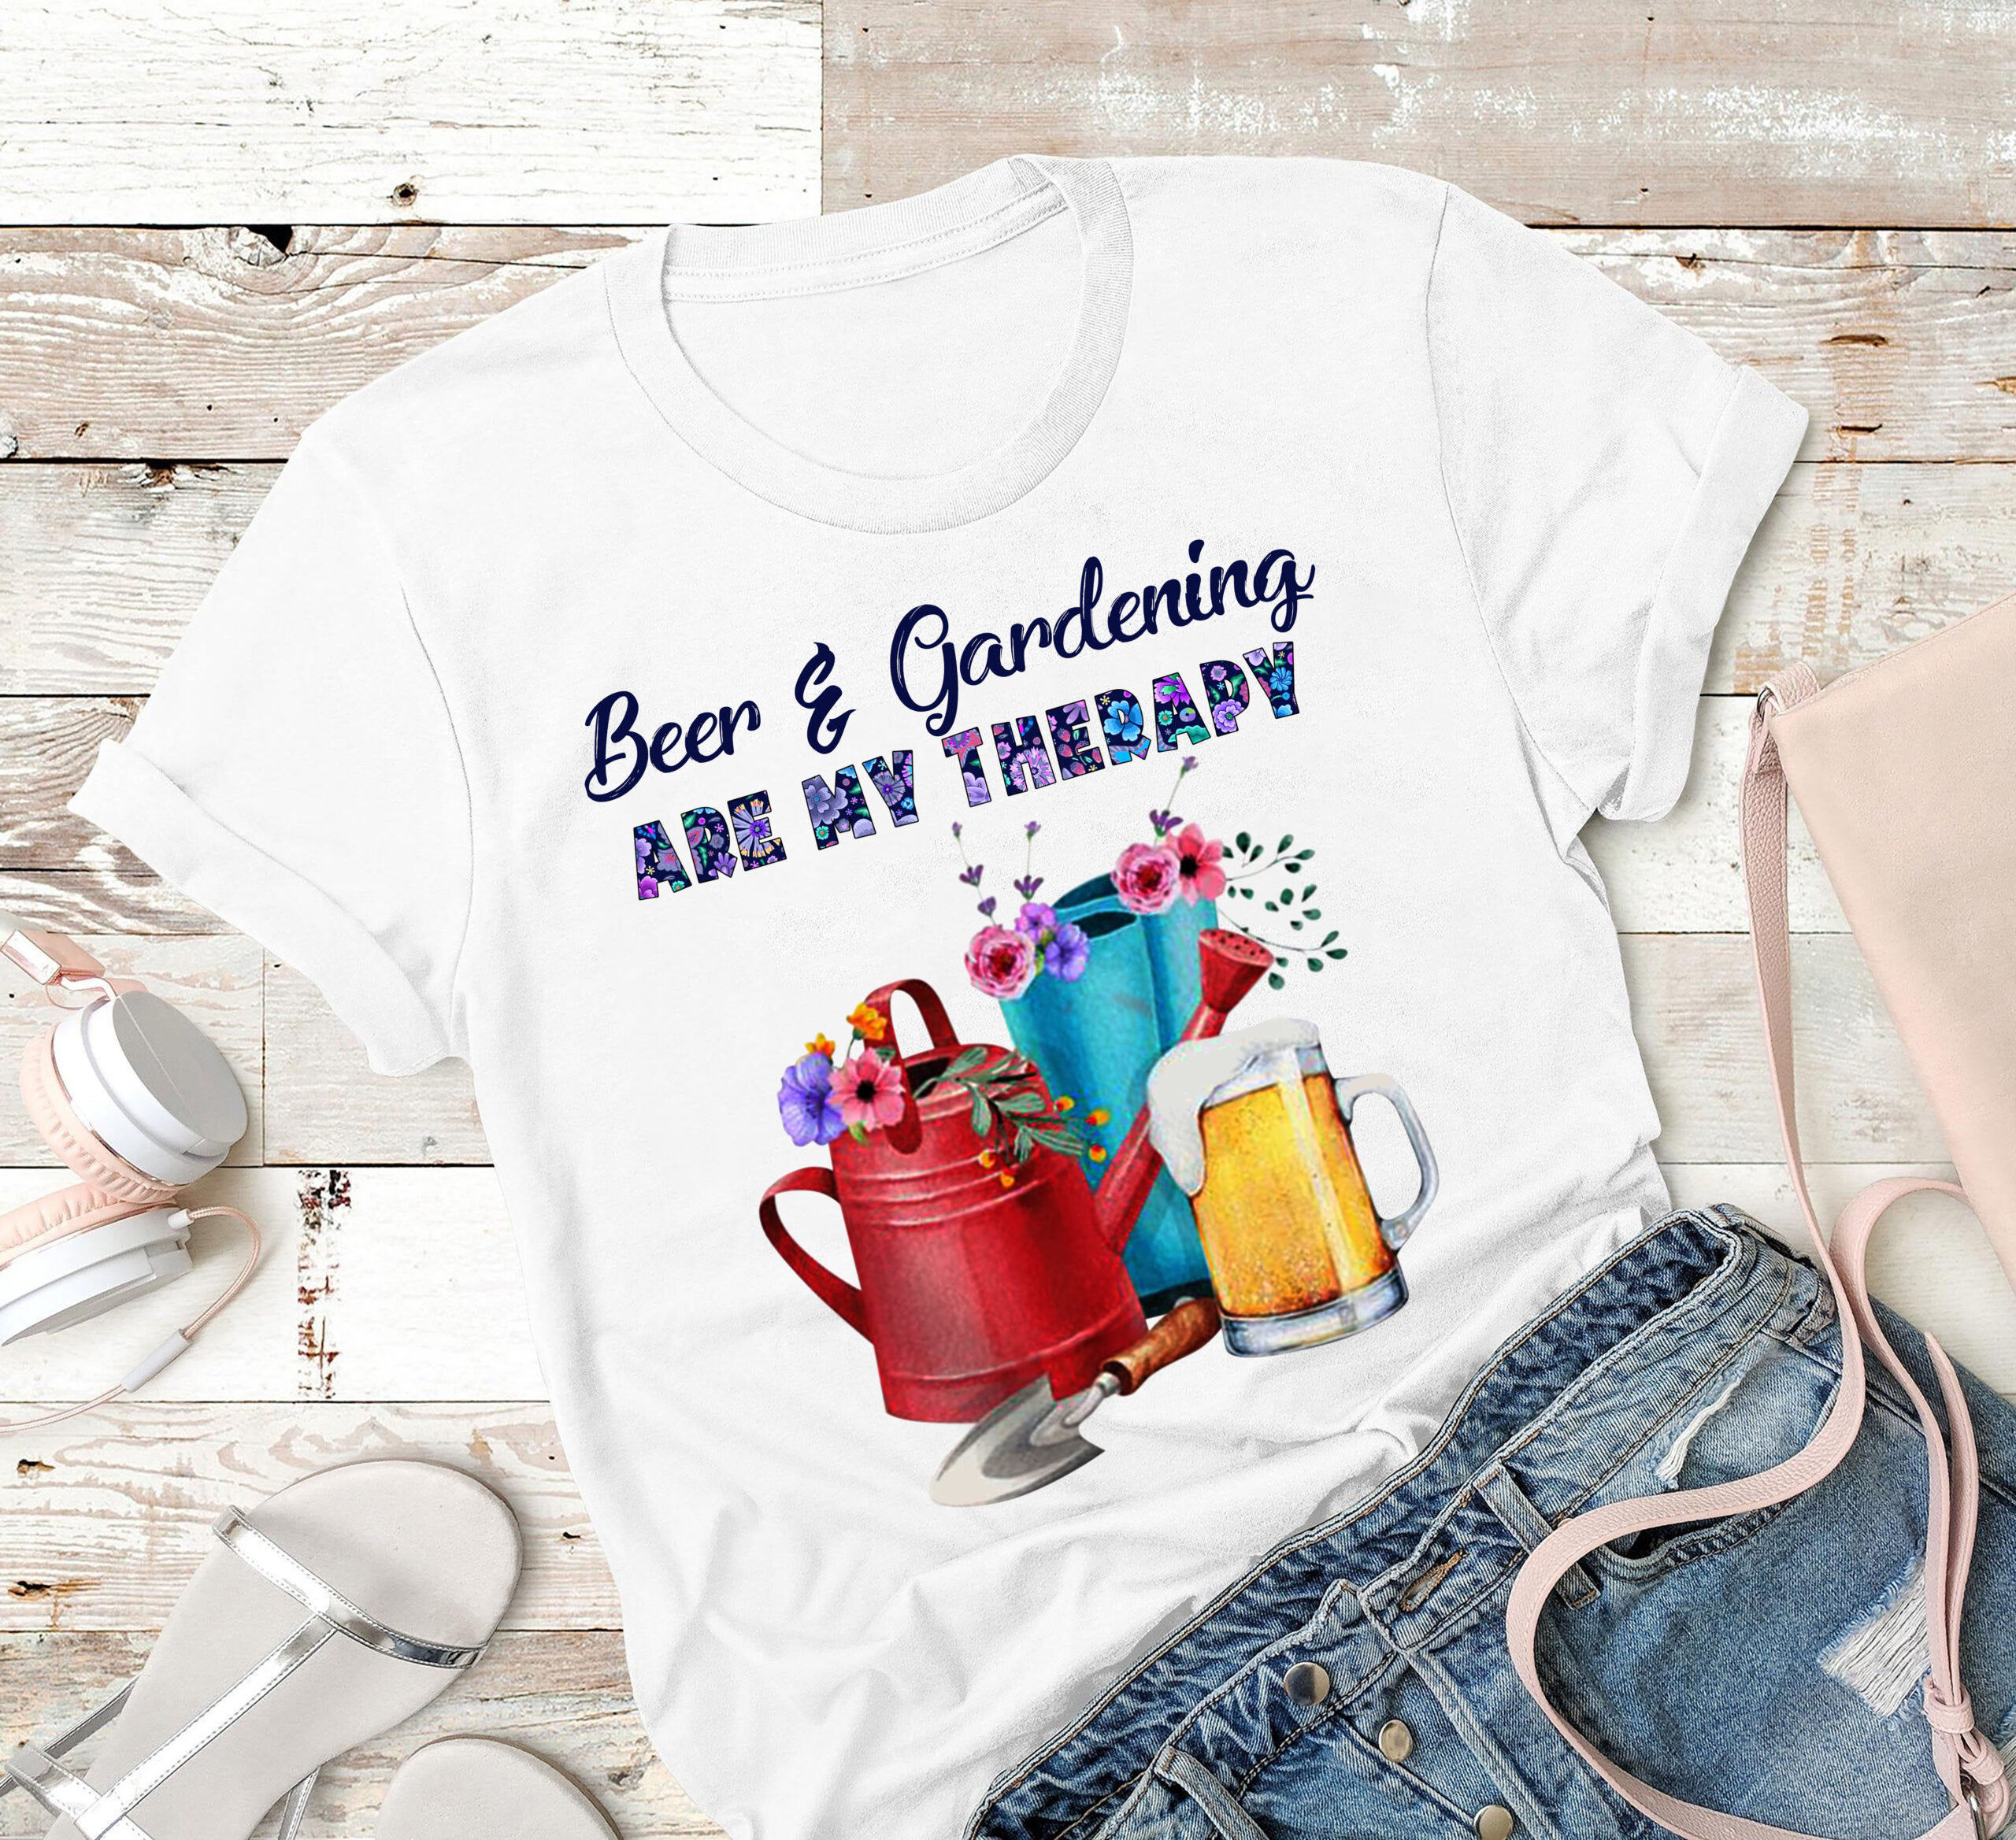 Gardener Shirt Beer & Gardening Are My Therapy